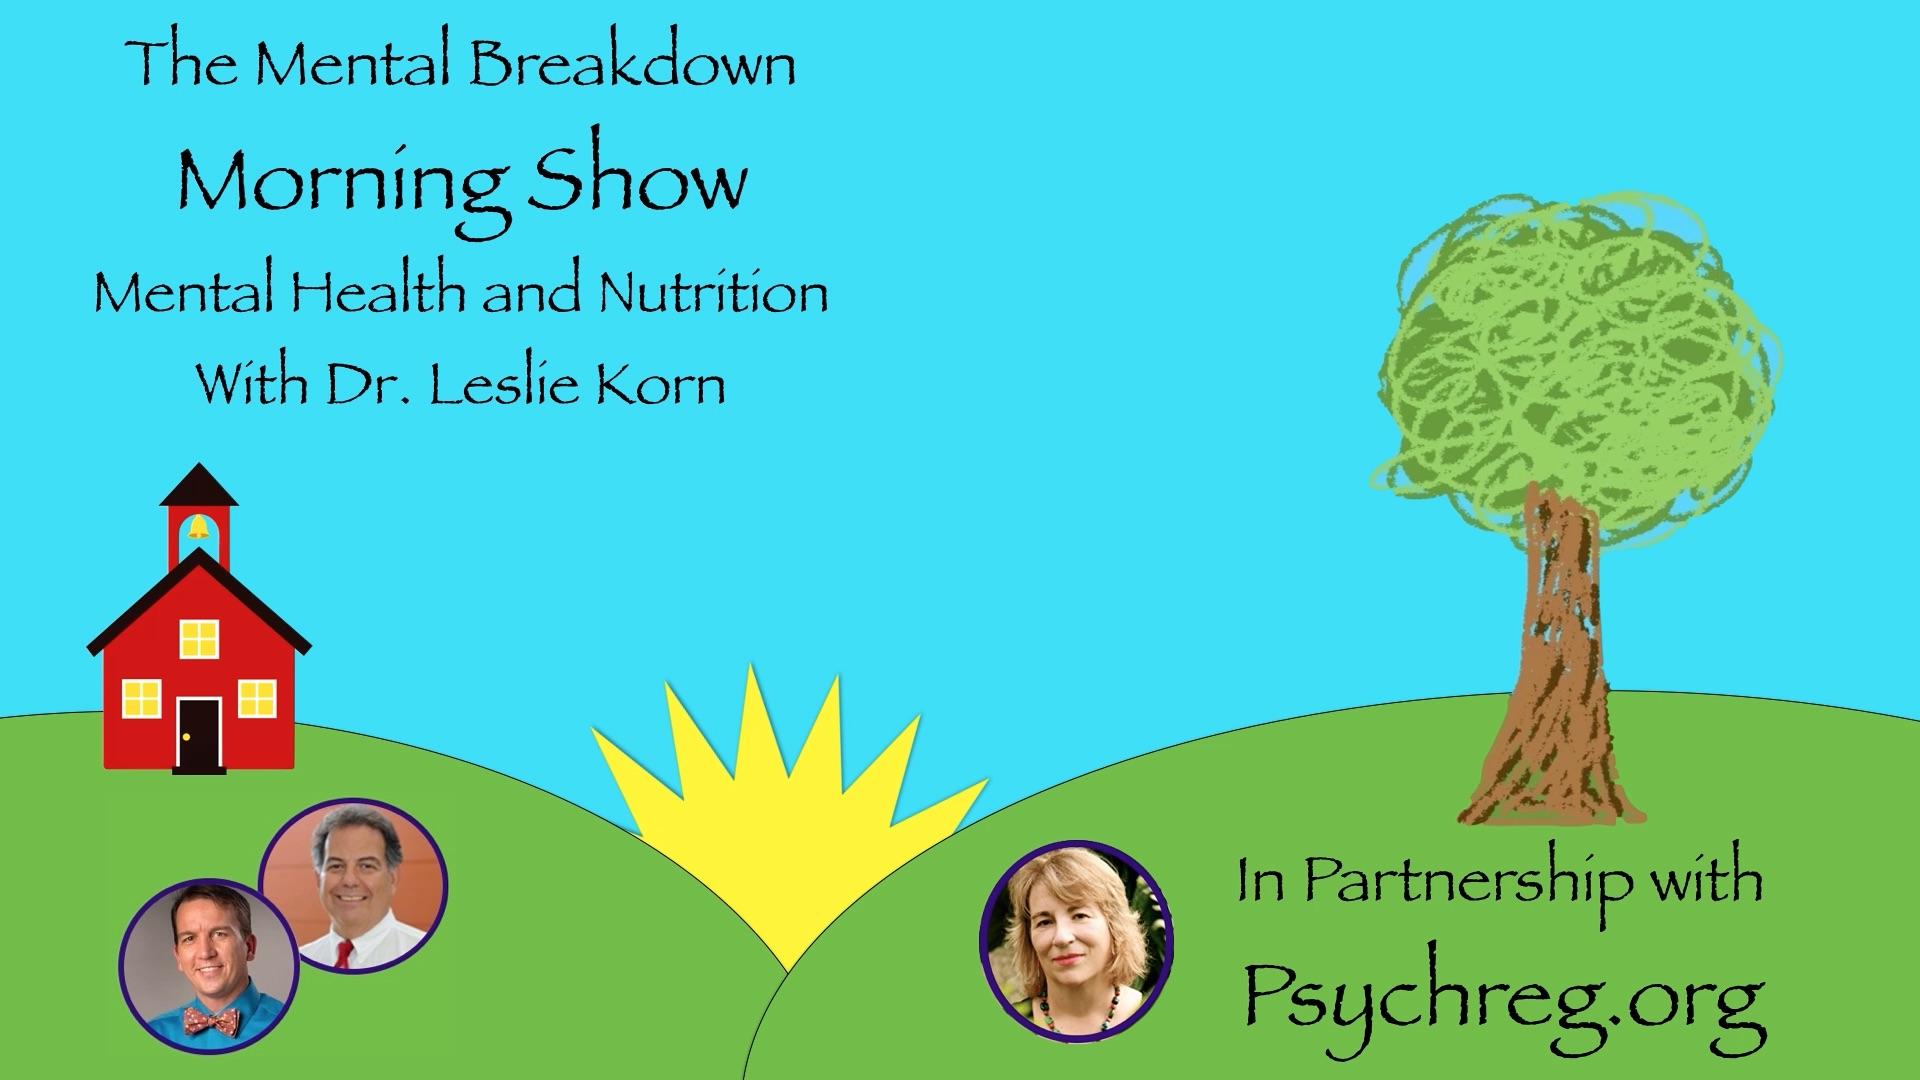 Mental Health And Nutrition With Dr Leslie Korn